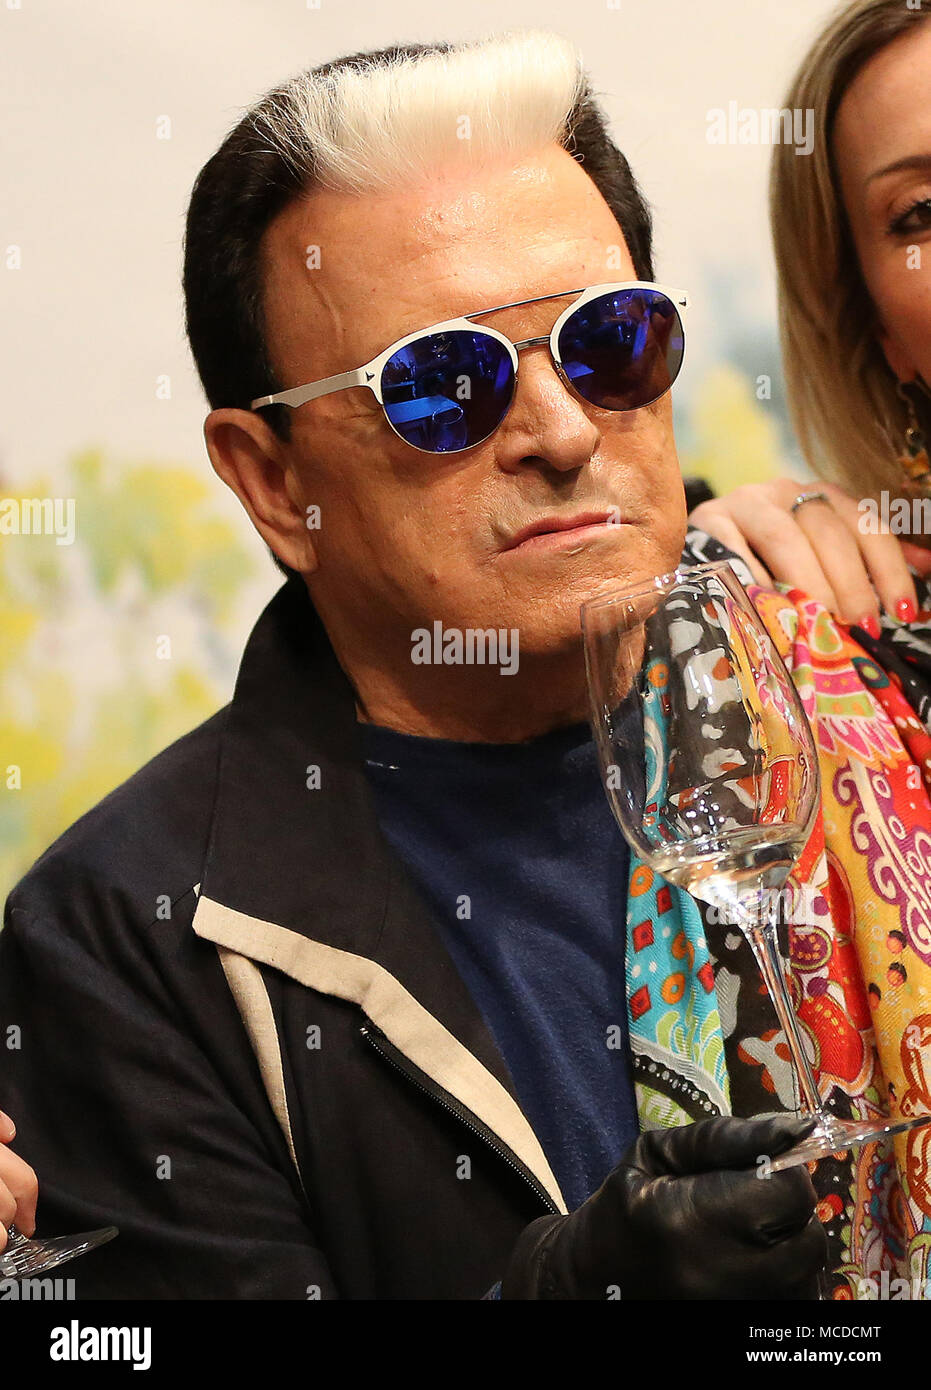 PHOTOPRESS Vinitaly 2018, Verona Cristiano Malgioglio Stock Photo - Alamy